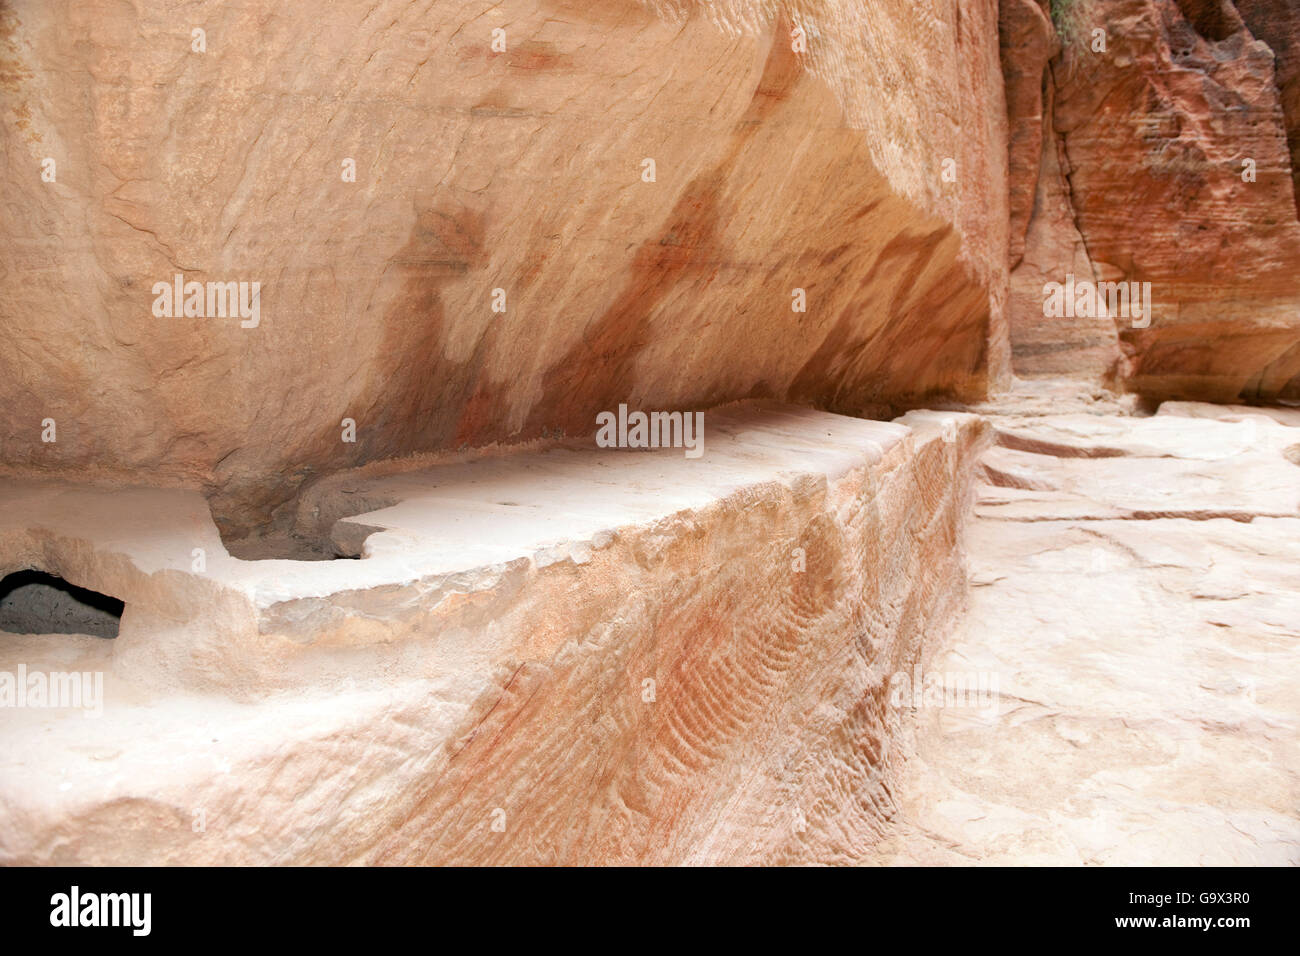 ancient watersupply in canyon, ancient pavestones, Siq of Petra, canyon of Petra Archaeological Park, Petra, Jordan, Stock Photo